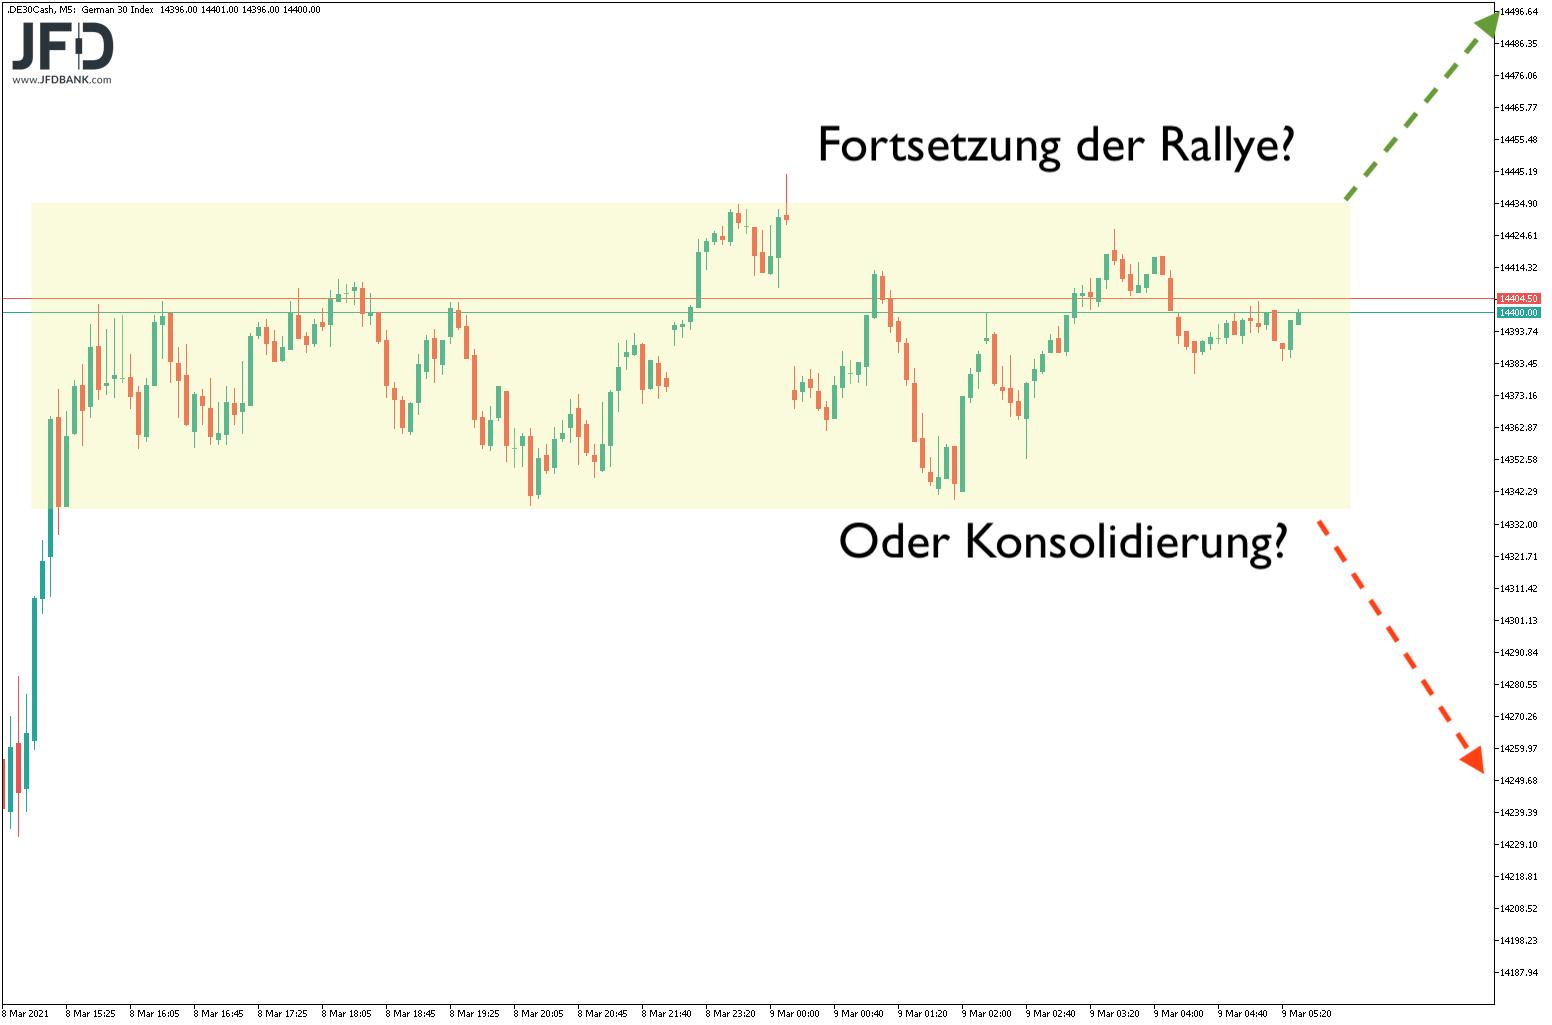 DAX-Rekordhoch-erzielt-halten-wir-das-Niveau-Kommentar-JFD-Bank-GodmodeTrader.de-7